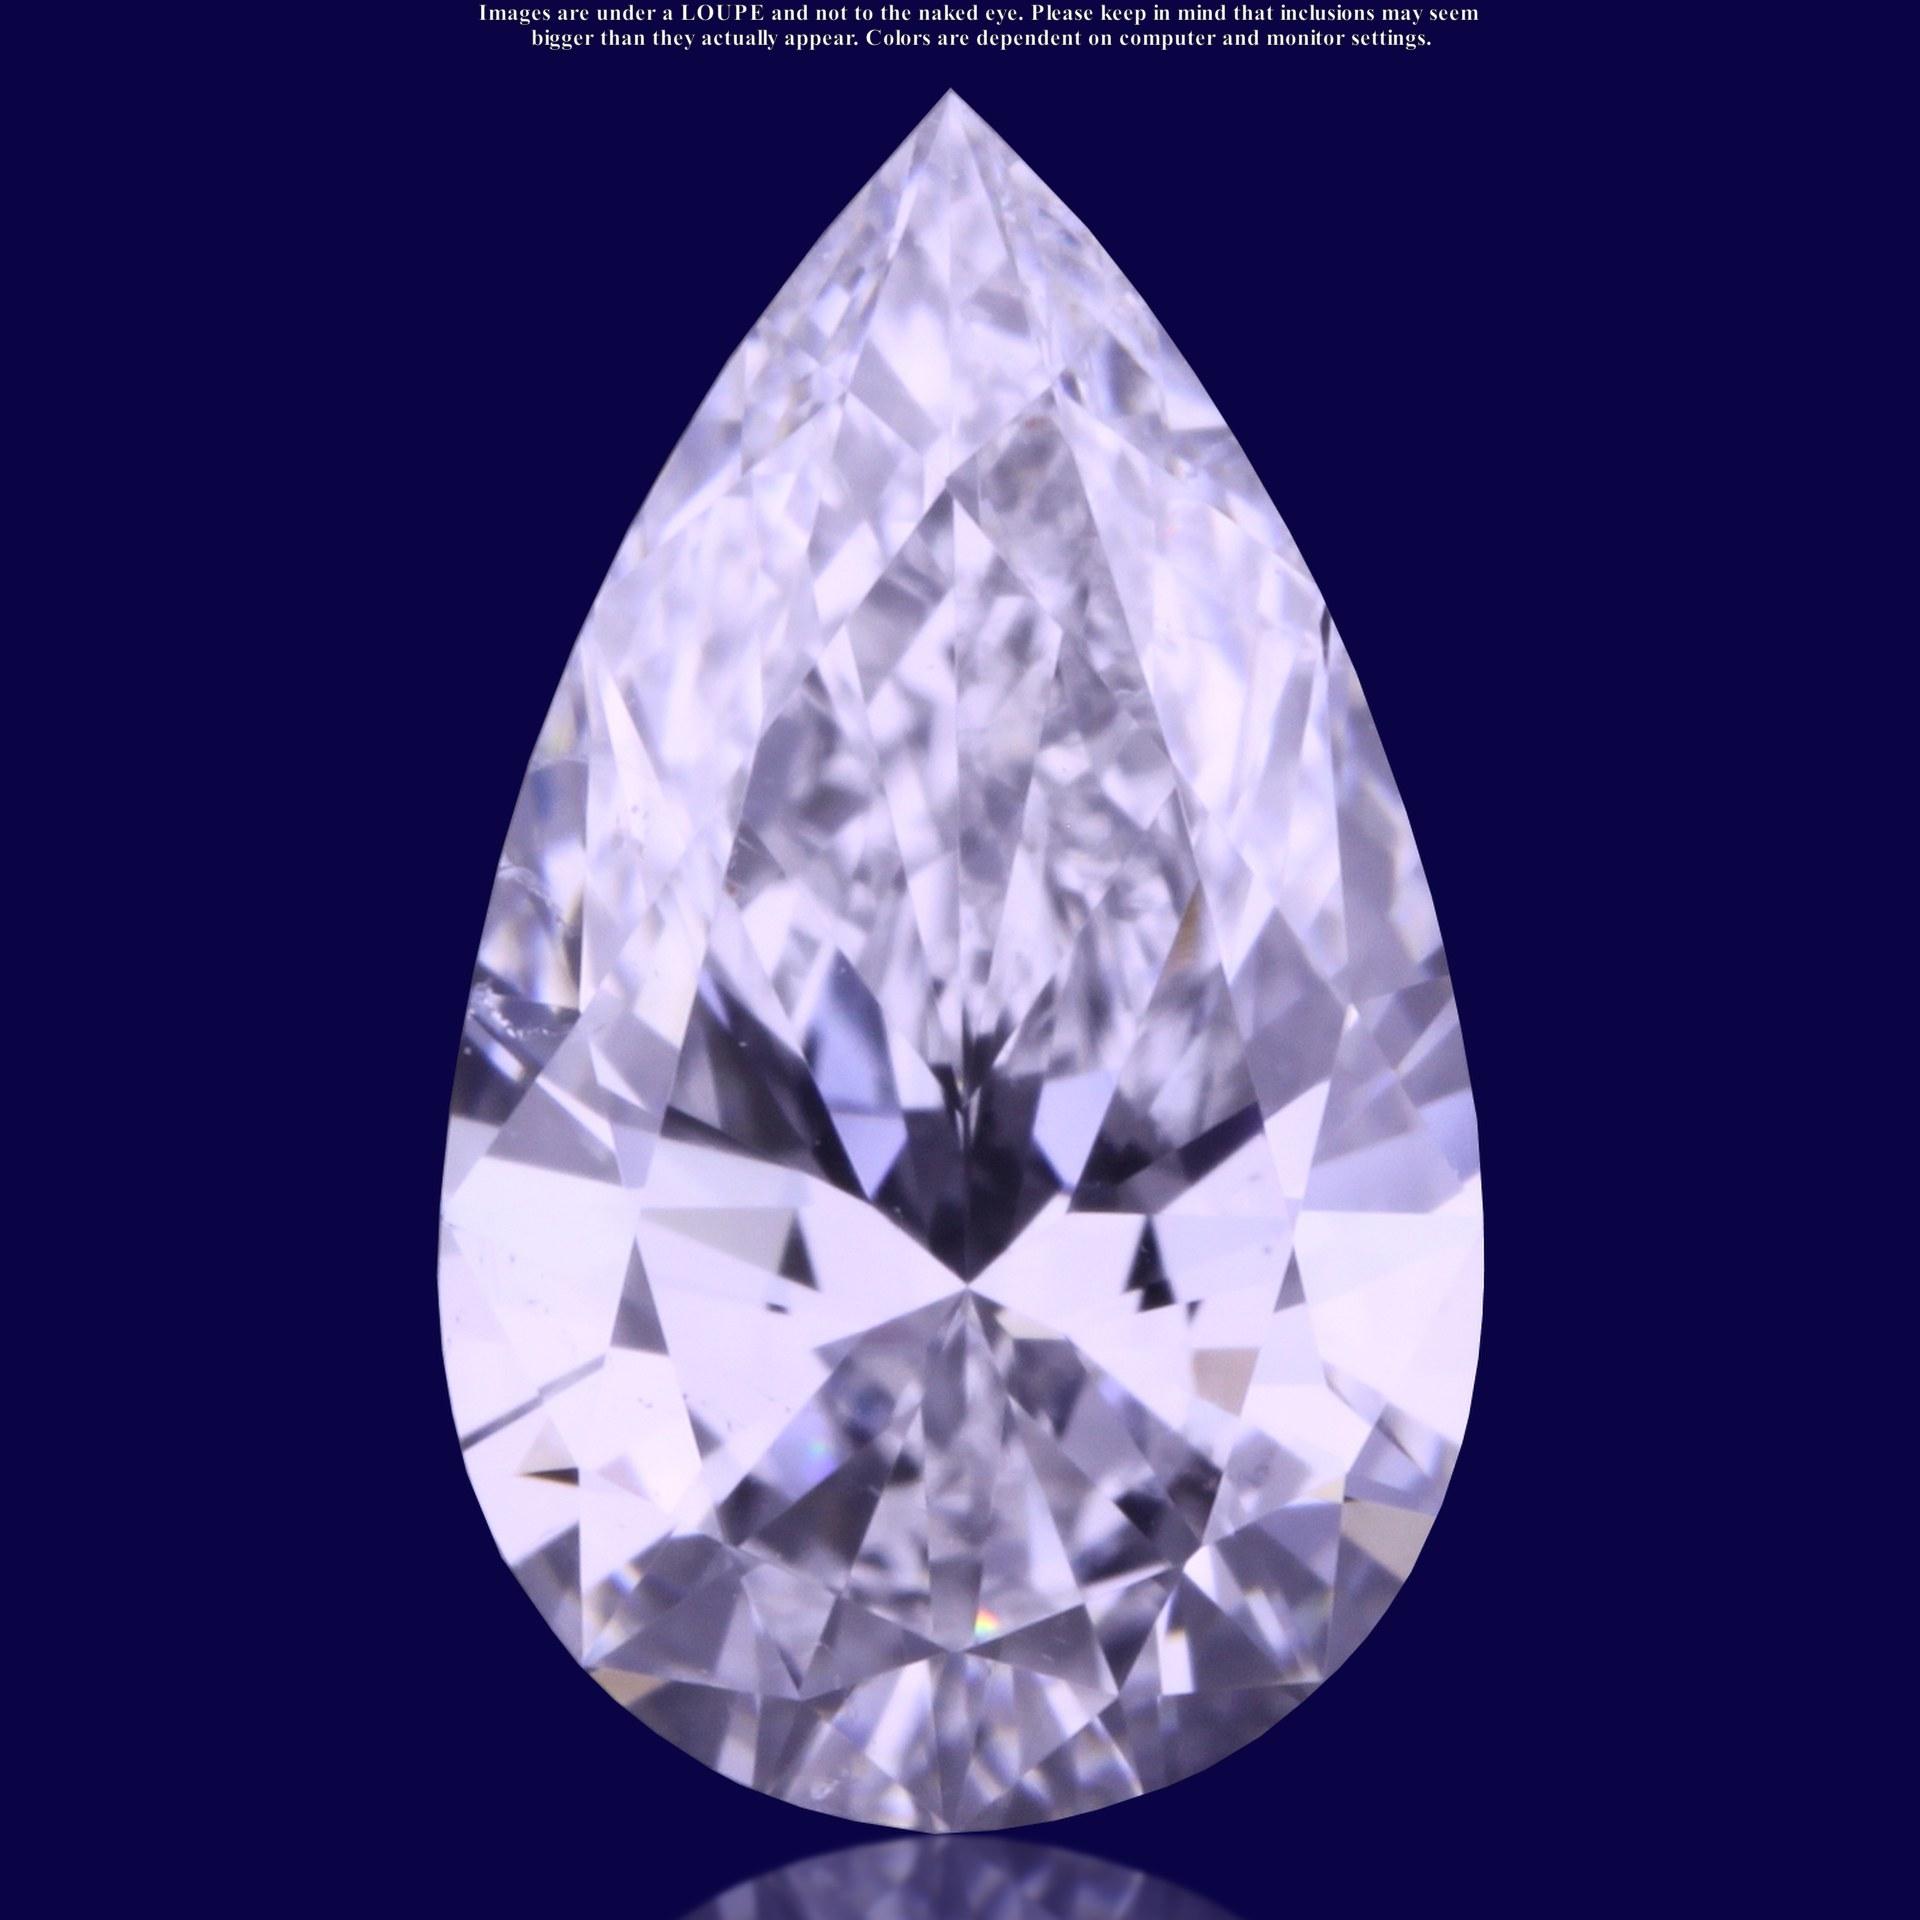 Gumer & Co Jewelry - Diamond Image - .01255